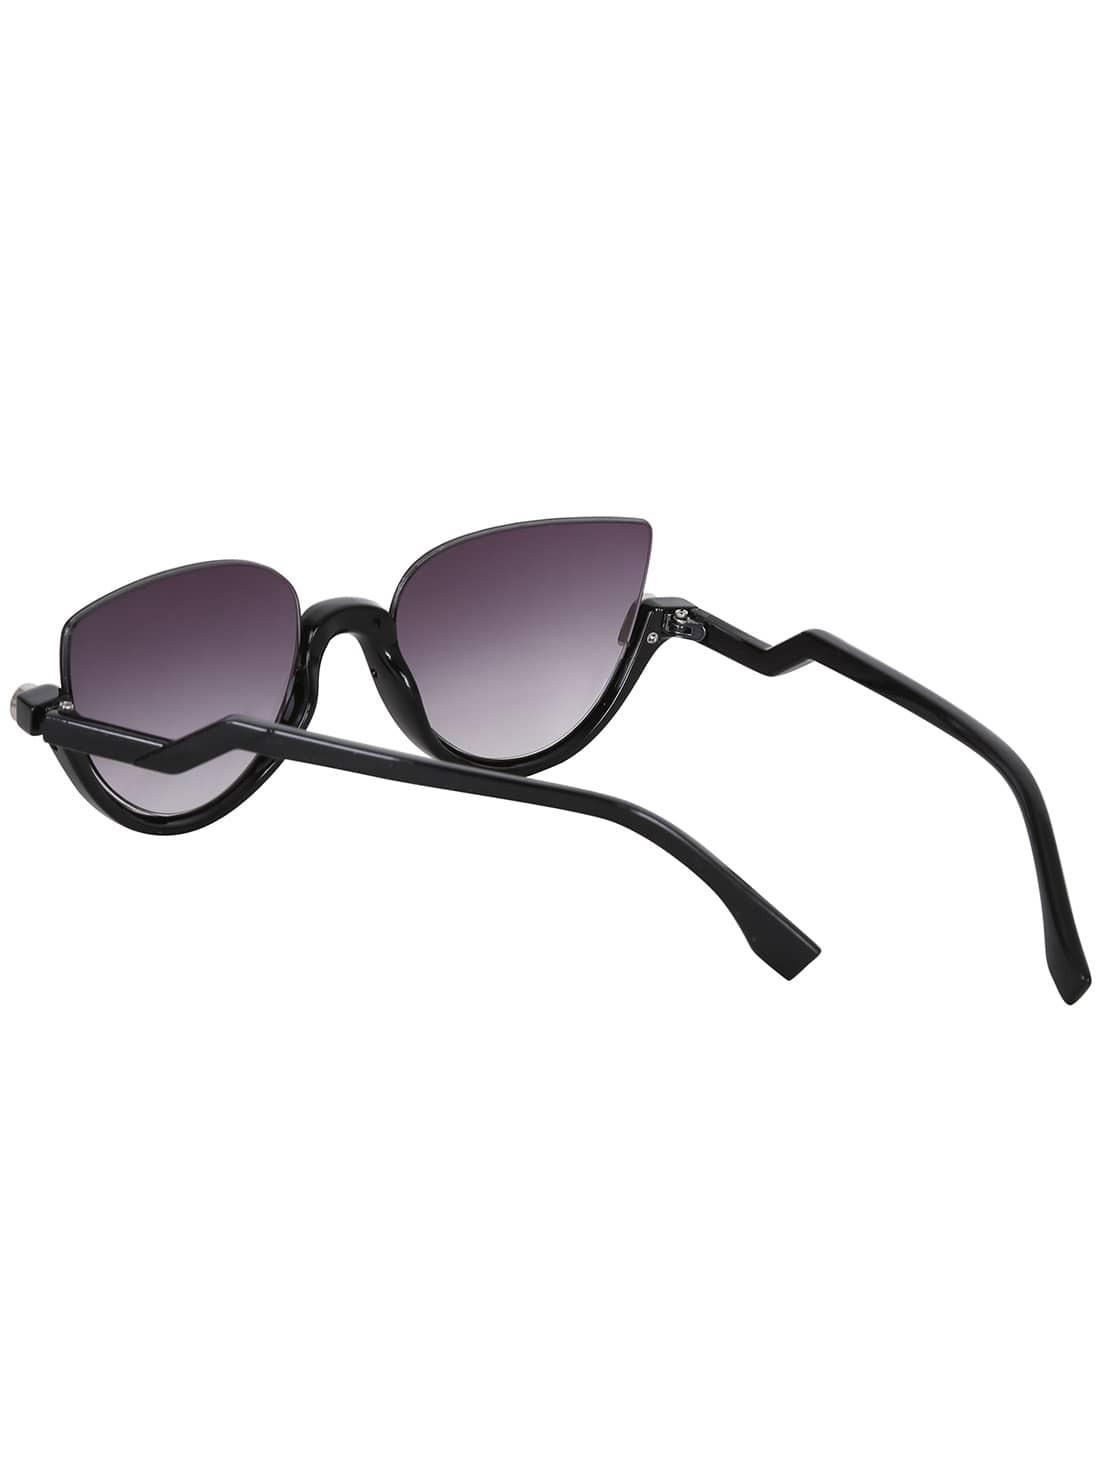 Black Half Frame Glasses : Cat Eye Black Half Frame Sunglasses -SheIn(Sheinside)